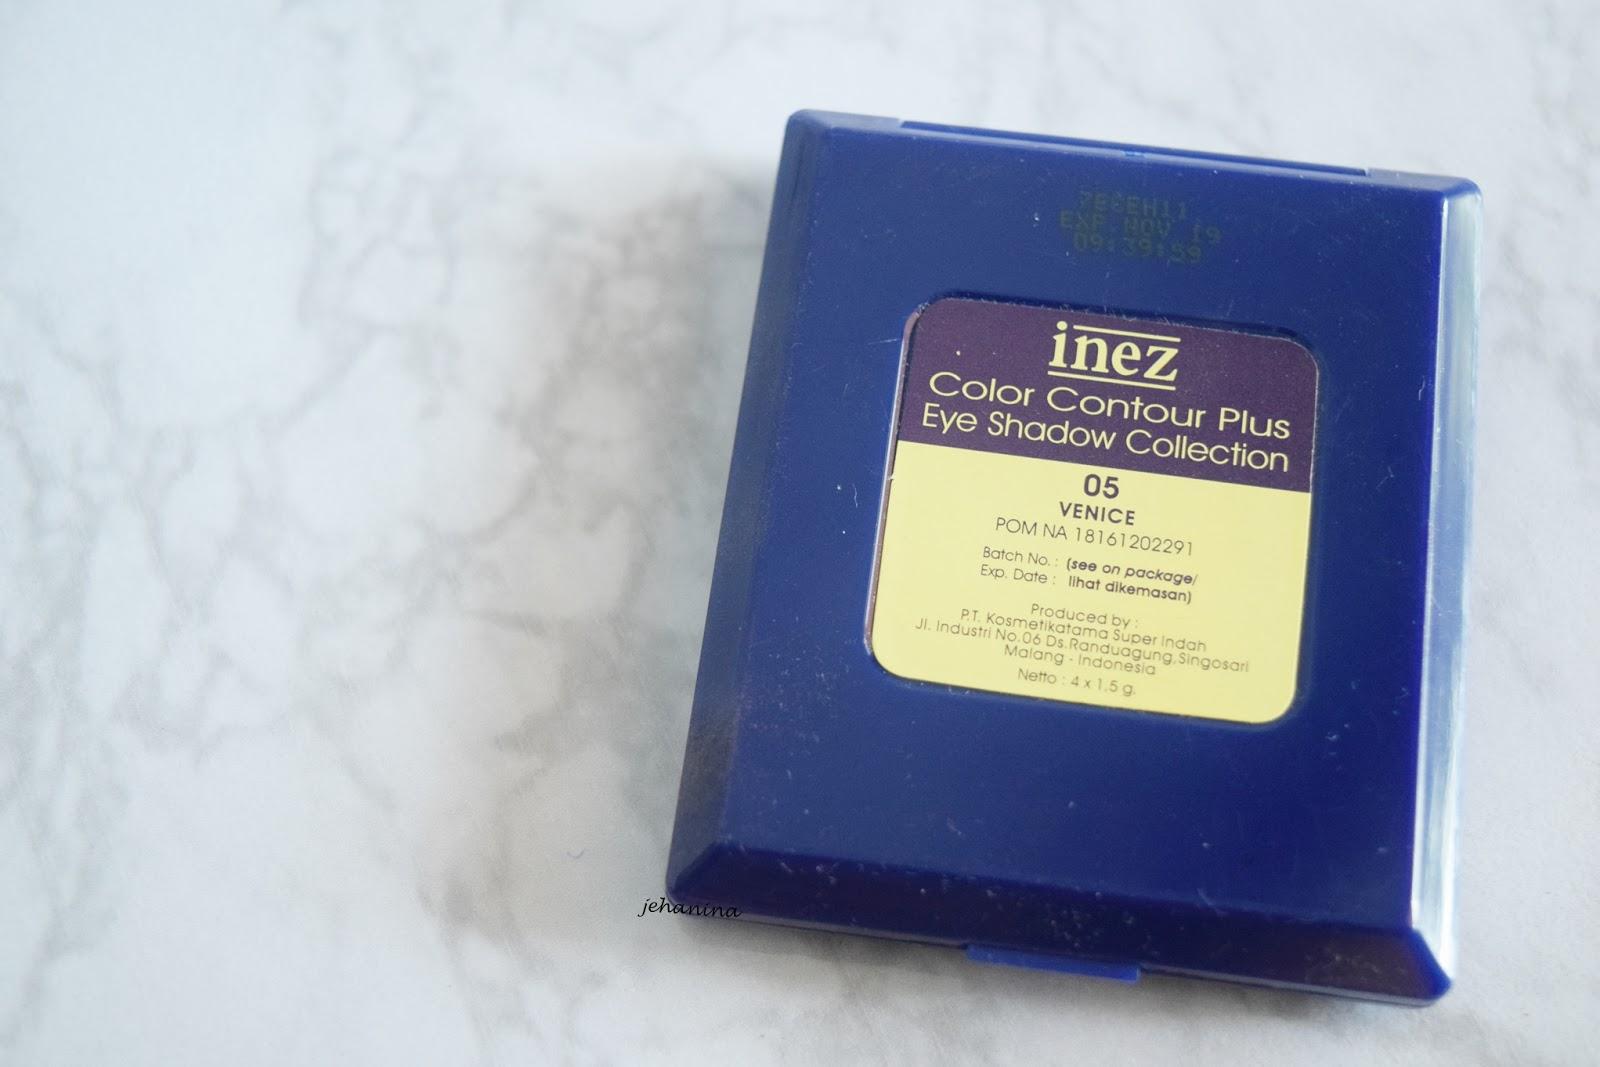 Jehanina Review Inez Eyeshadow Color Contour Plus No 05 Venice Collection 06 Alaska Packagingnya Berbentuk Pact Berwarna Biru Tua Dengan Ada Logo Gold Shoo Simple